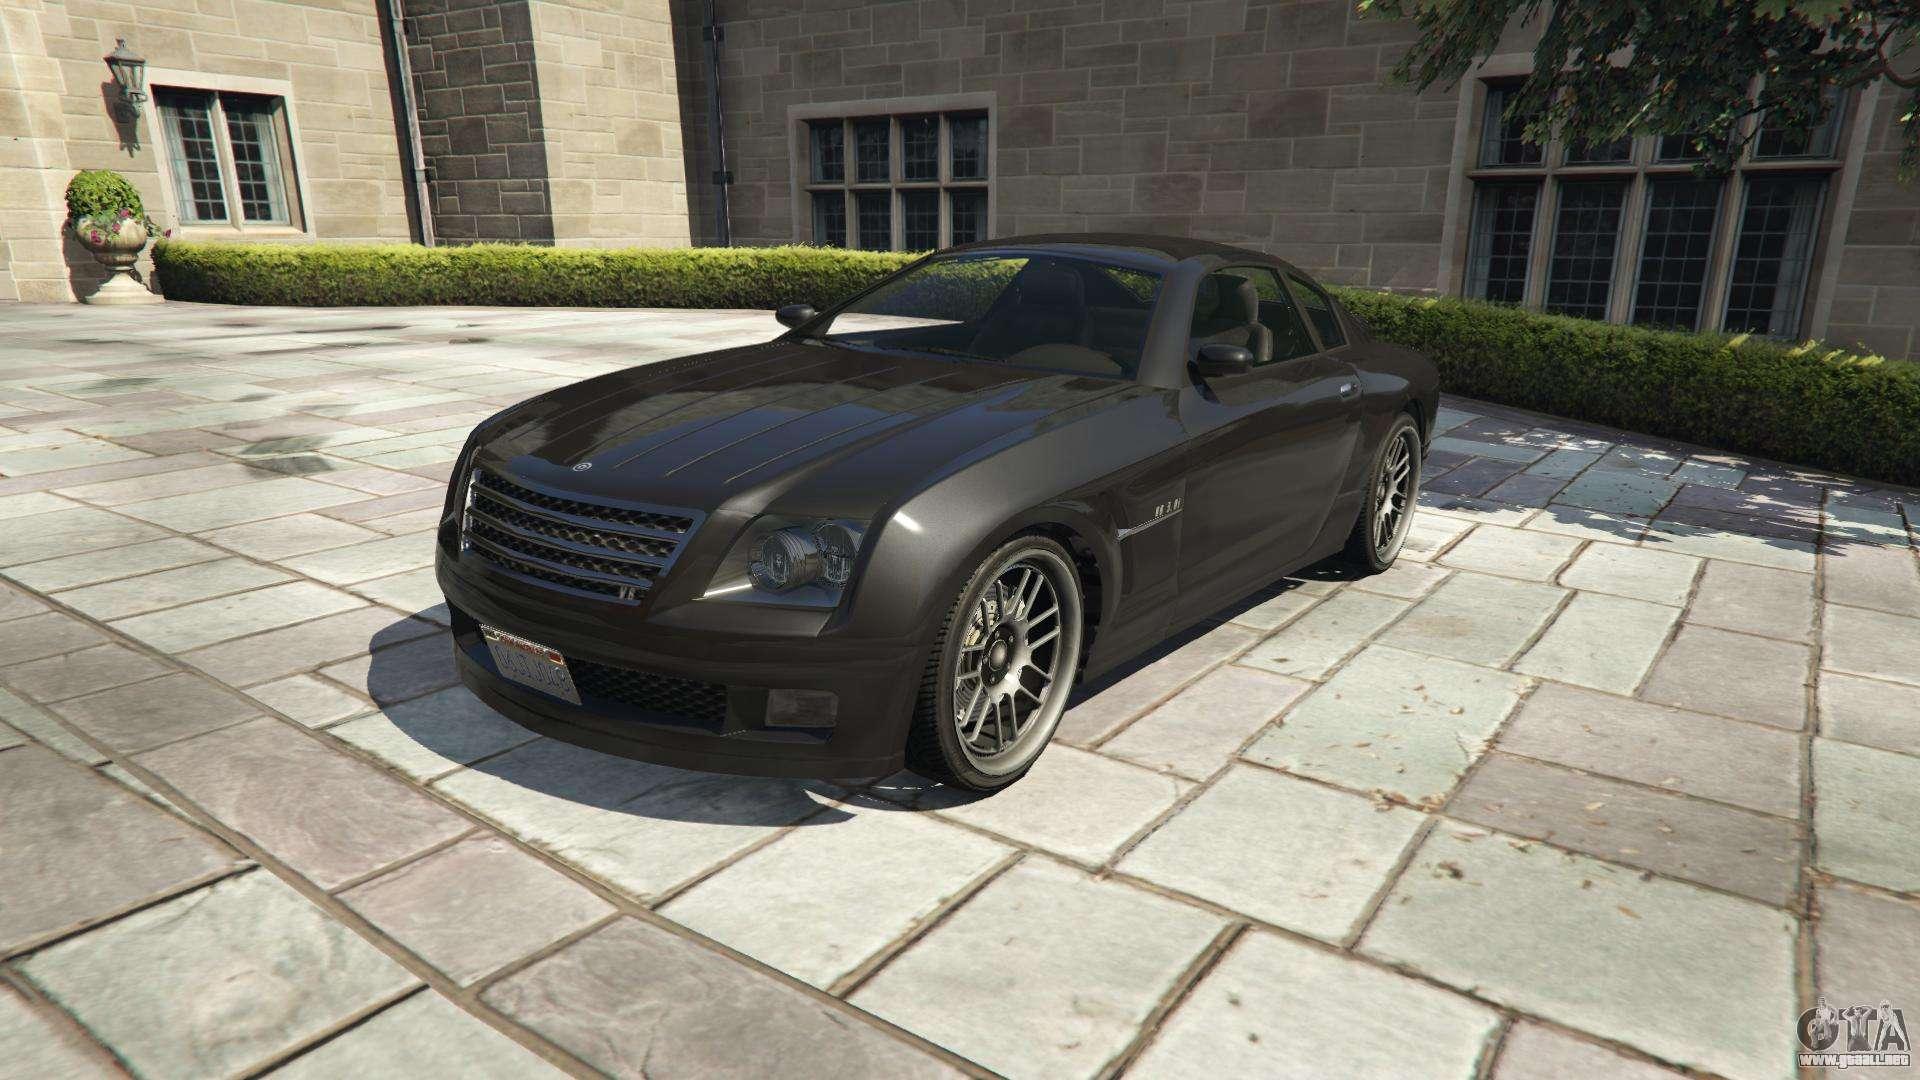 Picapleitos Fusilade de GTA 5 - vista frontal